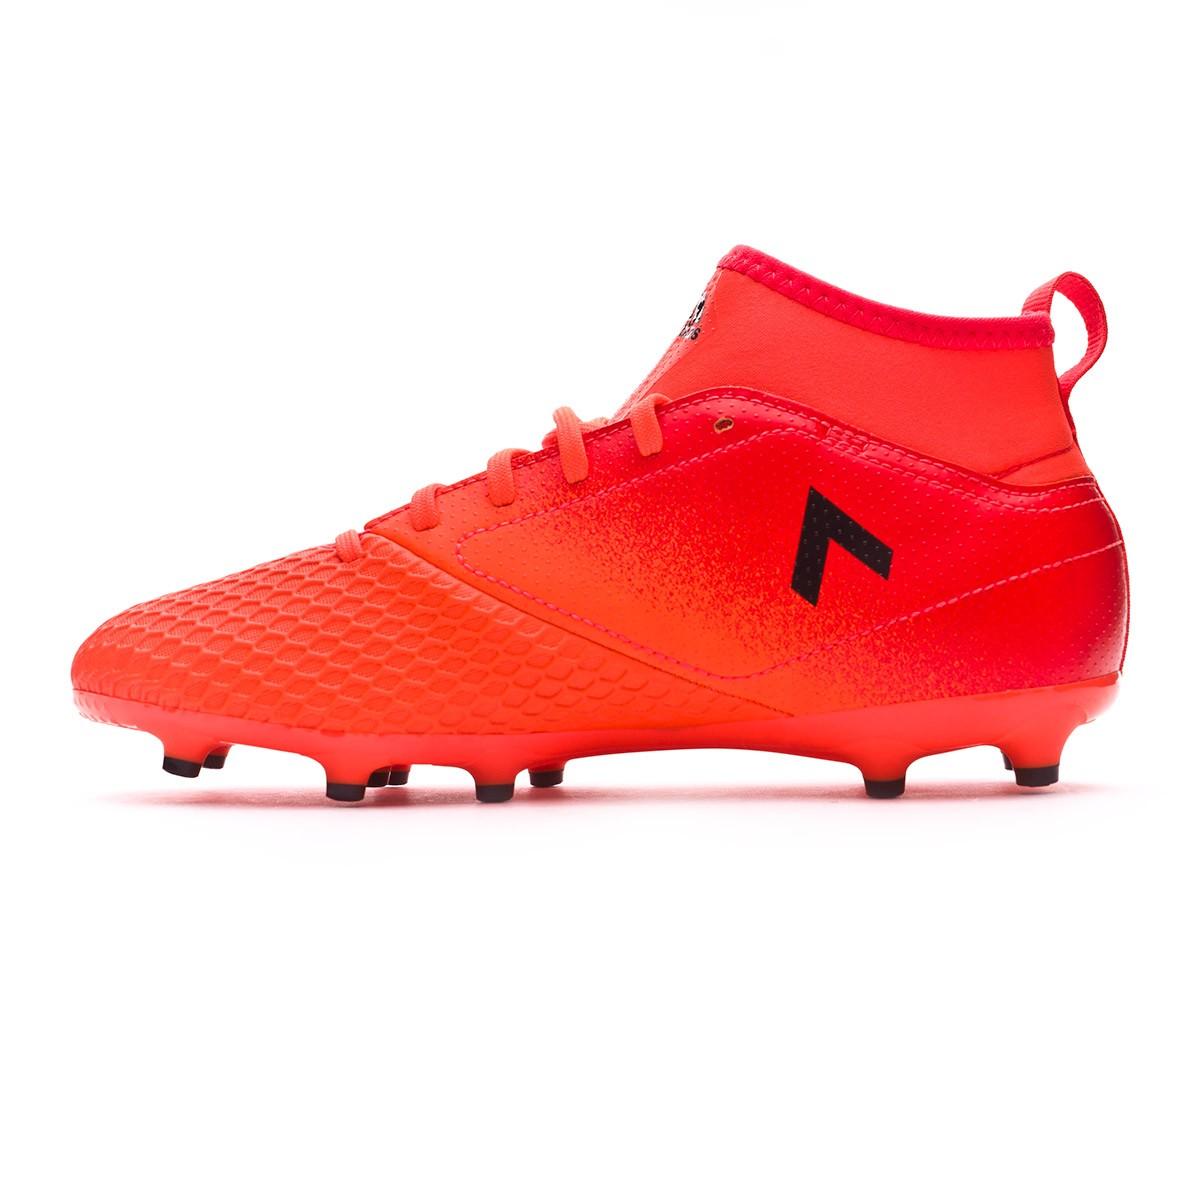 f54c25b78d65b Bota de fútbol adidas Ace 17.3 FG Niño Solar orange-Core black-Solar red -  Tienda de fútbol Fútbol Emotion